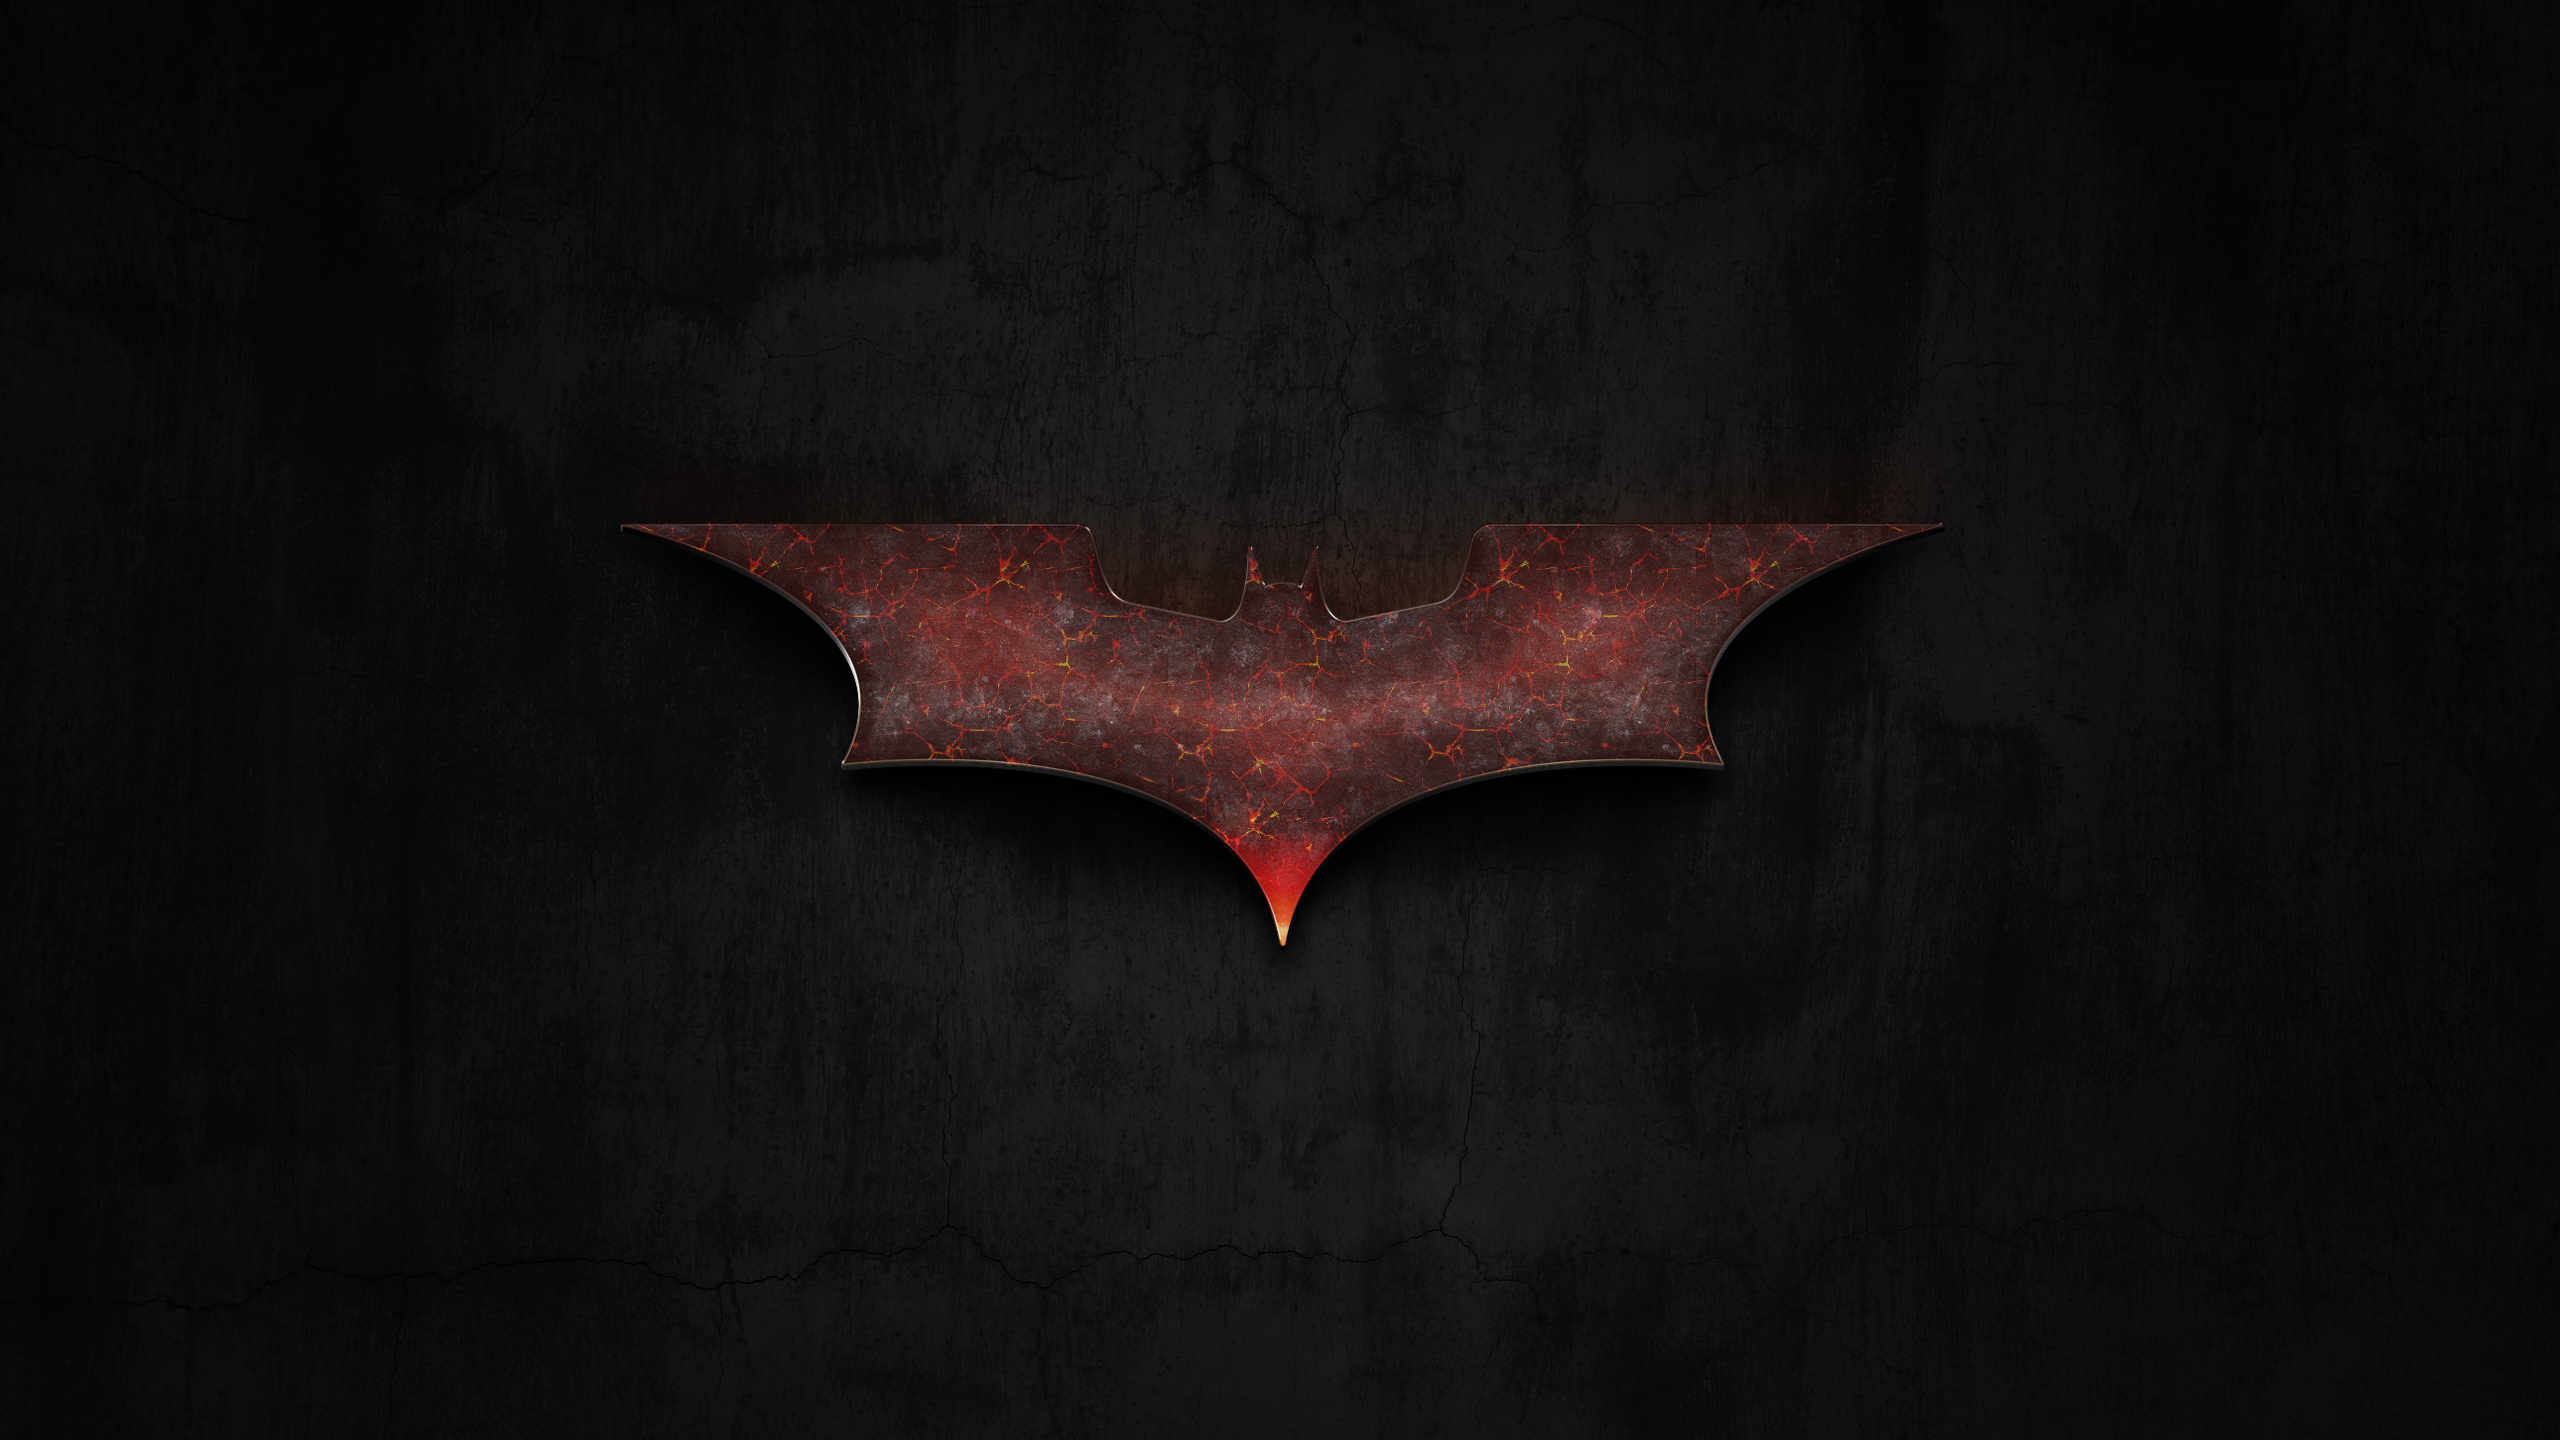 The Dark Knight Rises Wallpaper 70 | HD Desktop Wallpapers ... |Dark Knight Rises Iphone Wallpaper